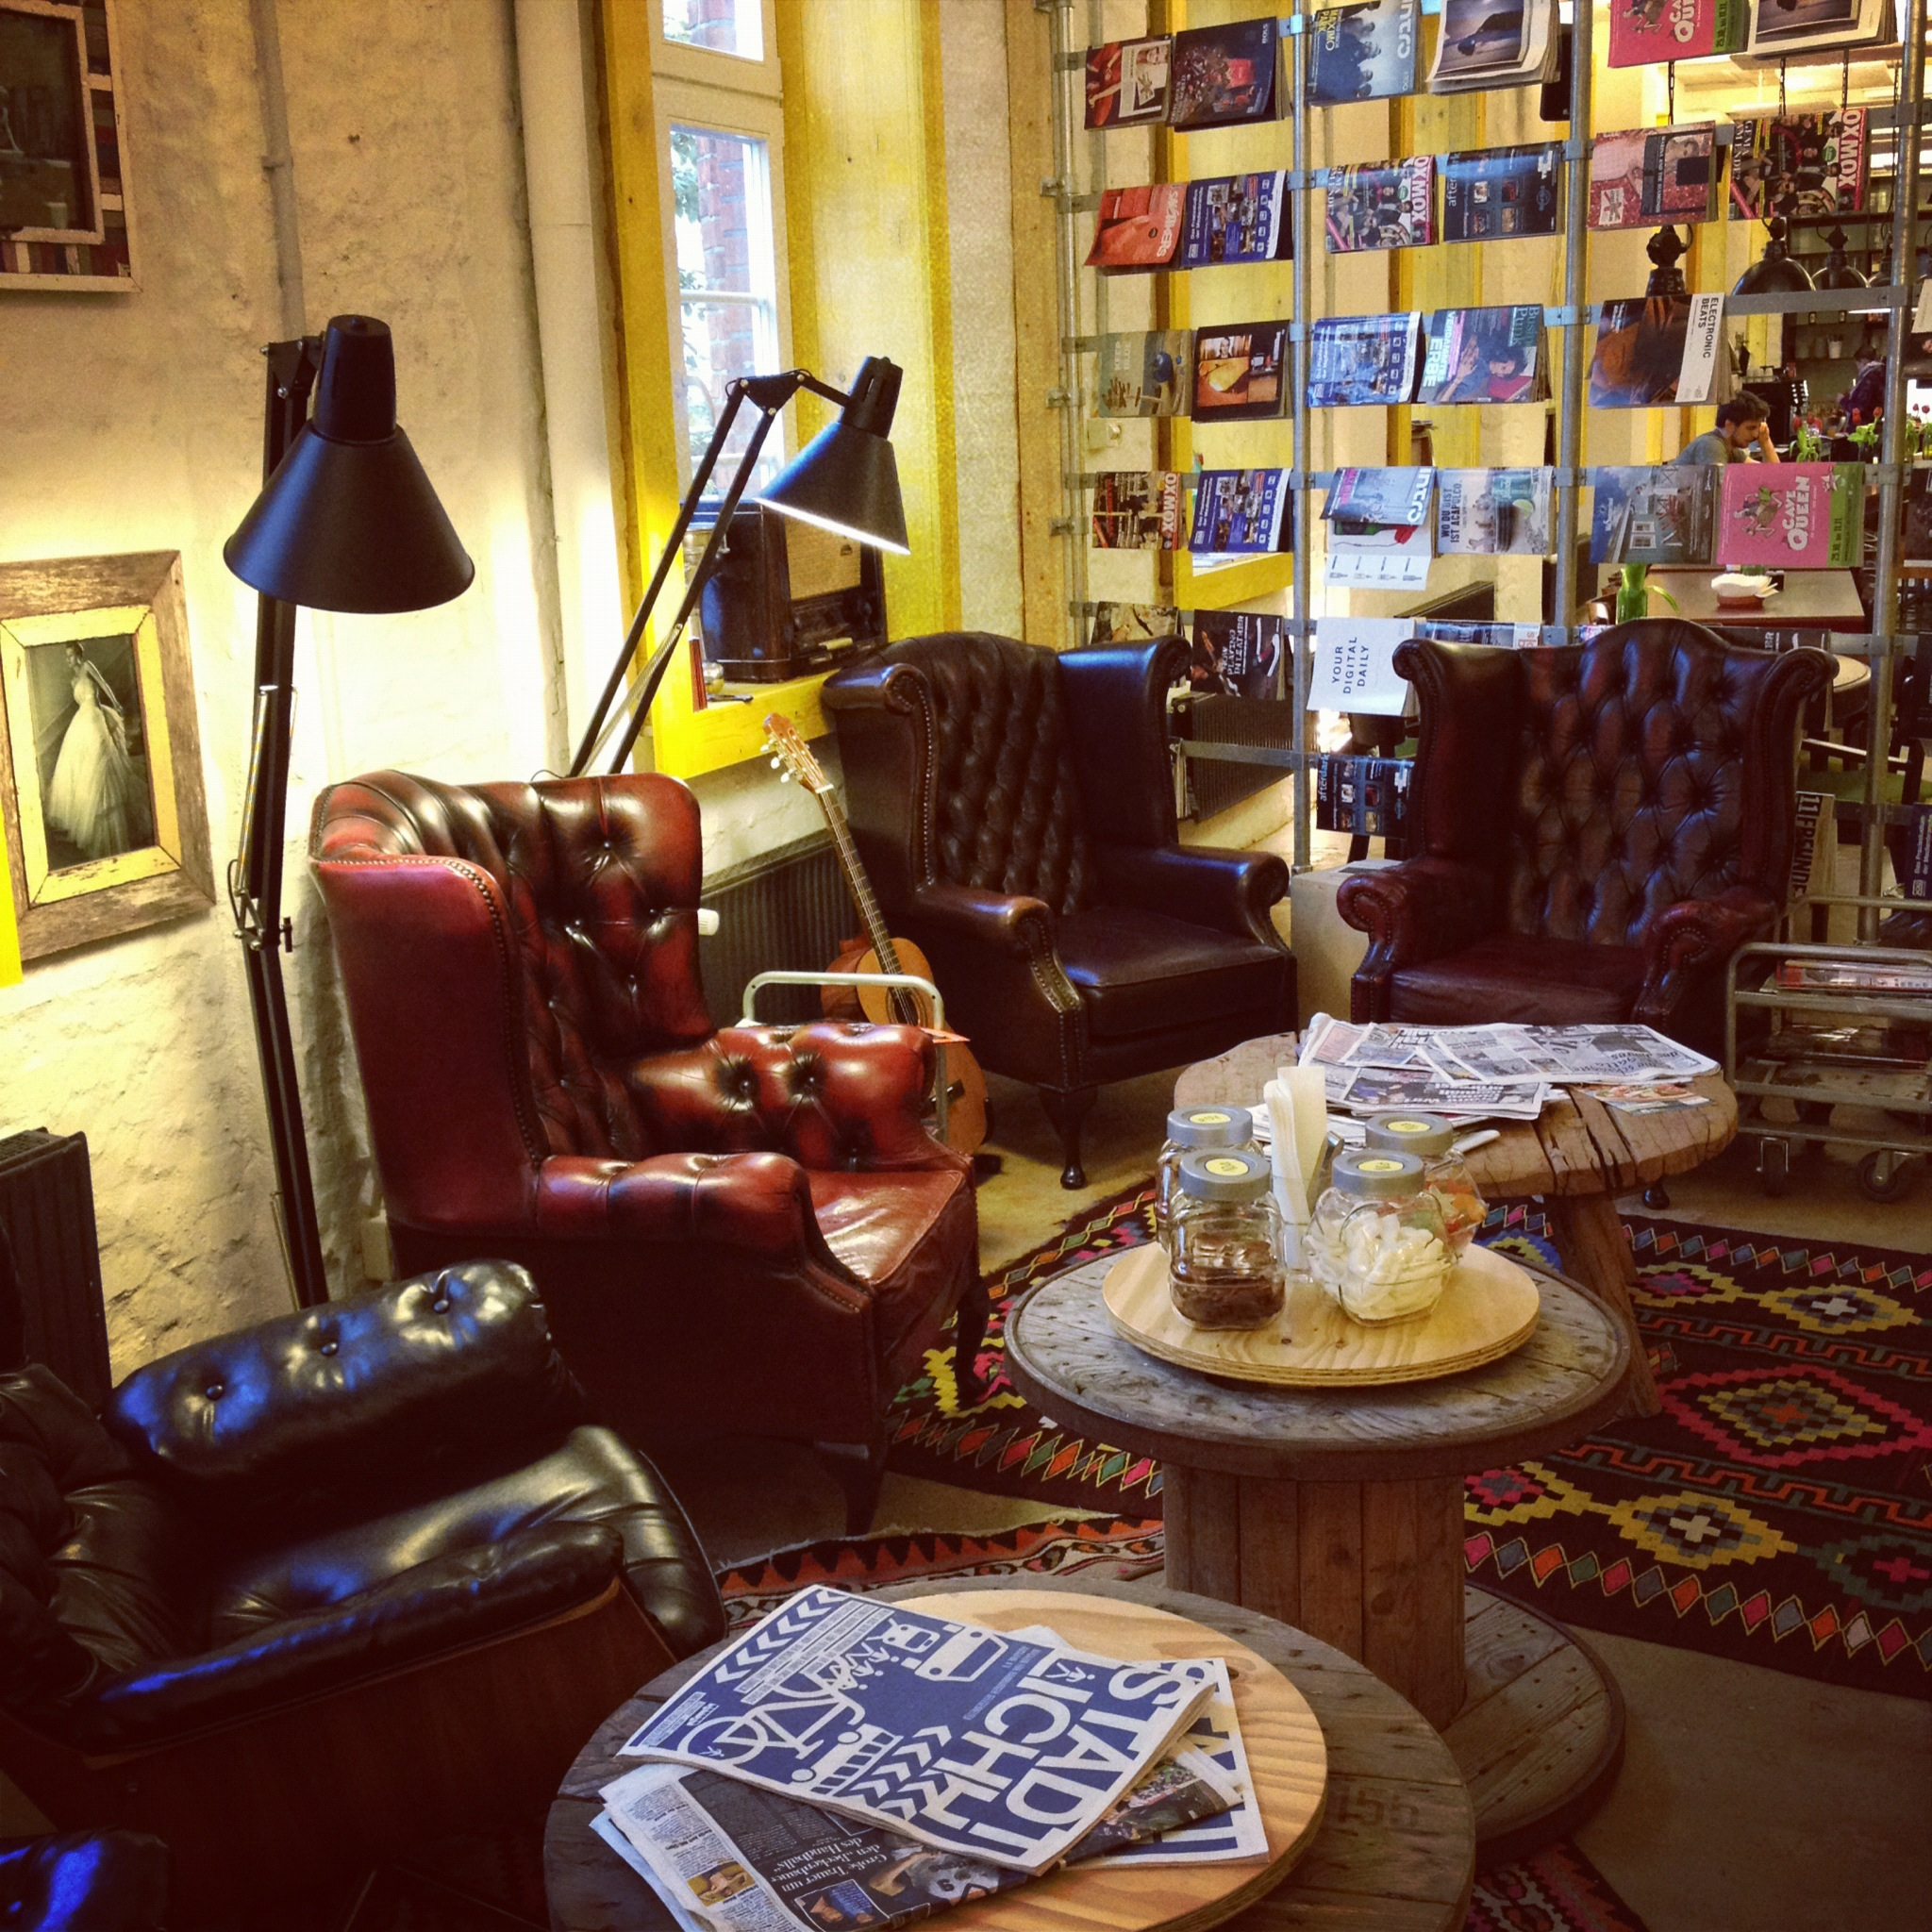 hamburg rockthekitchen. Black Bedroom Furniture Sets. Home Design Ideas